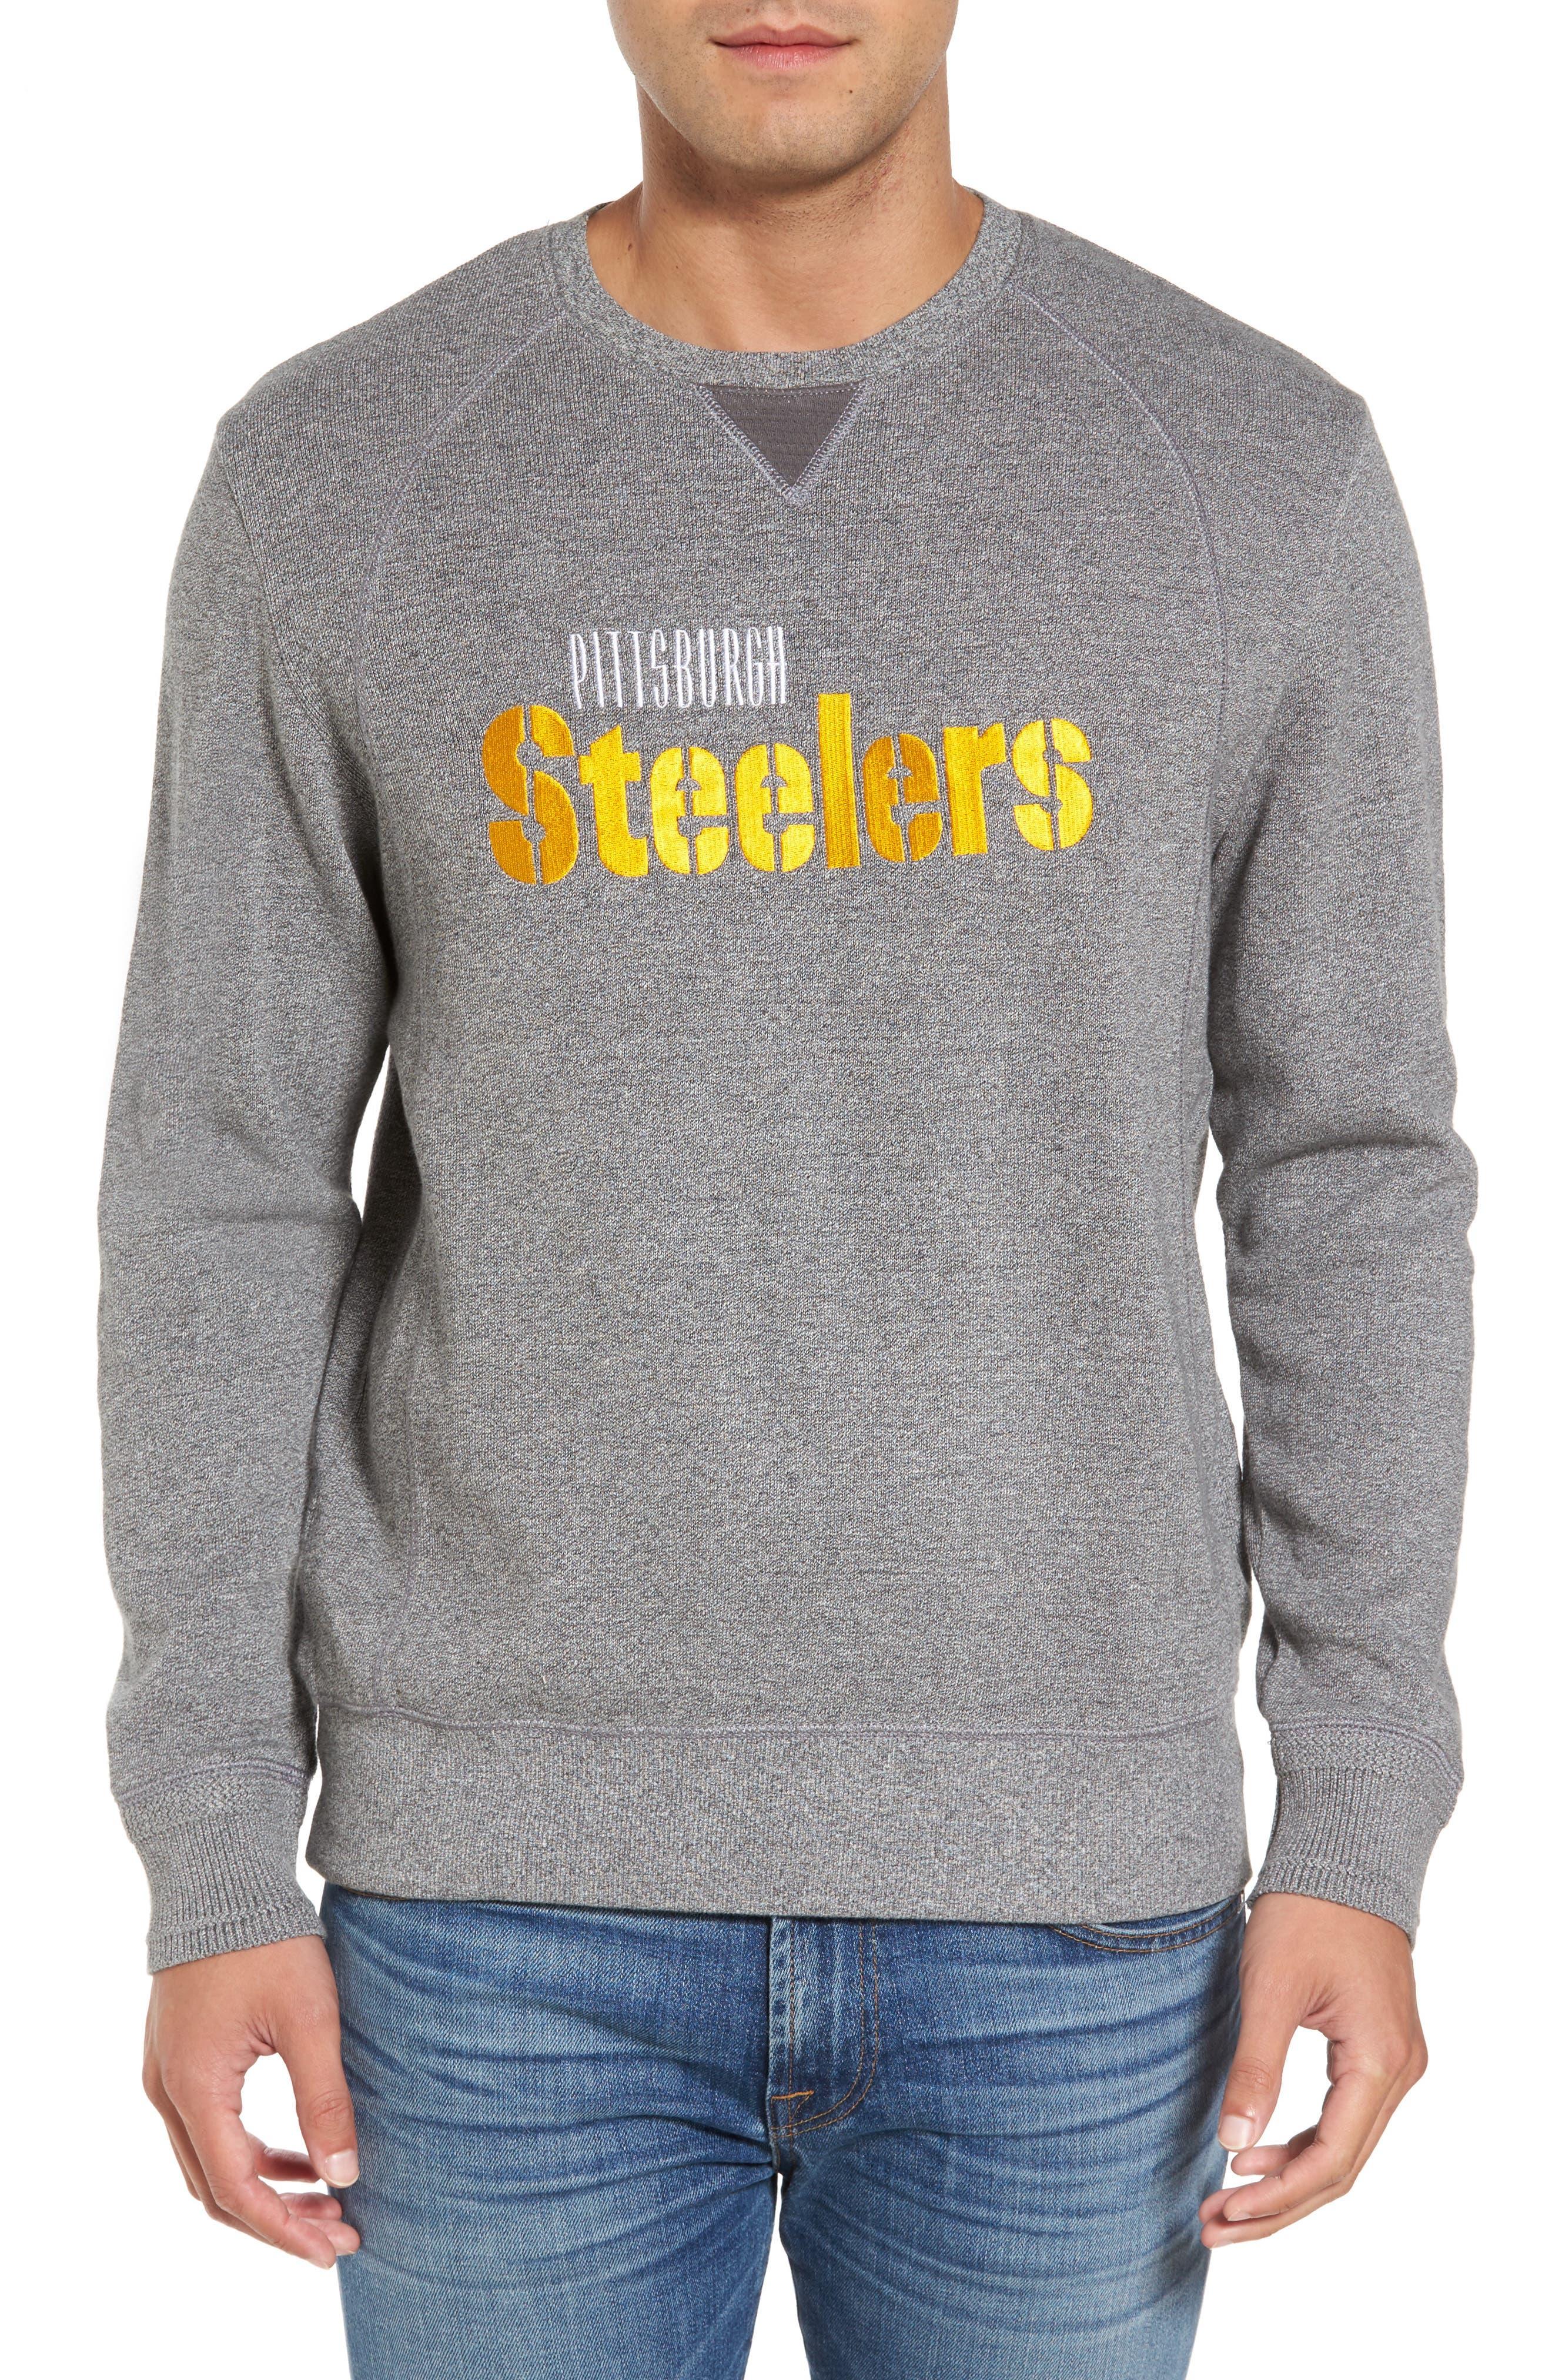 NFL Stitch of Liberty Embroidered Crewneck Sweatshirt,                             Main thumbnail 29, color,